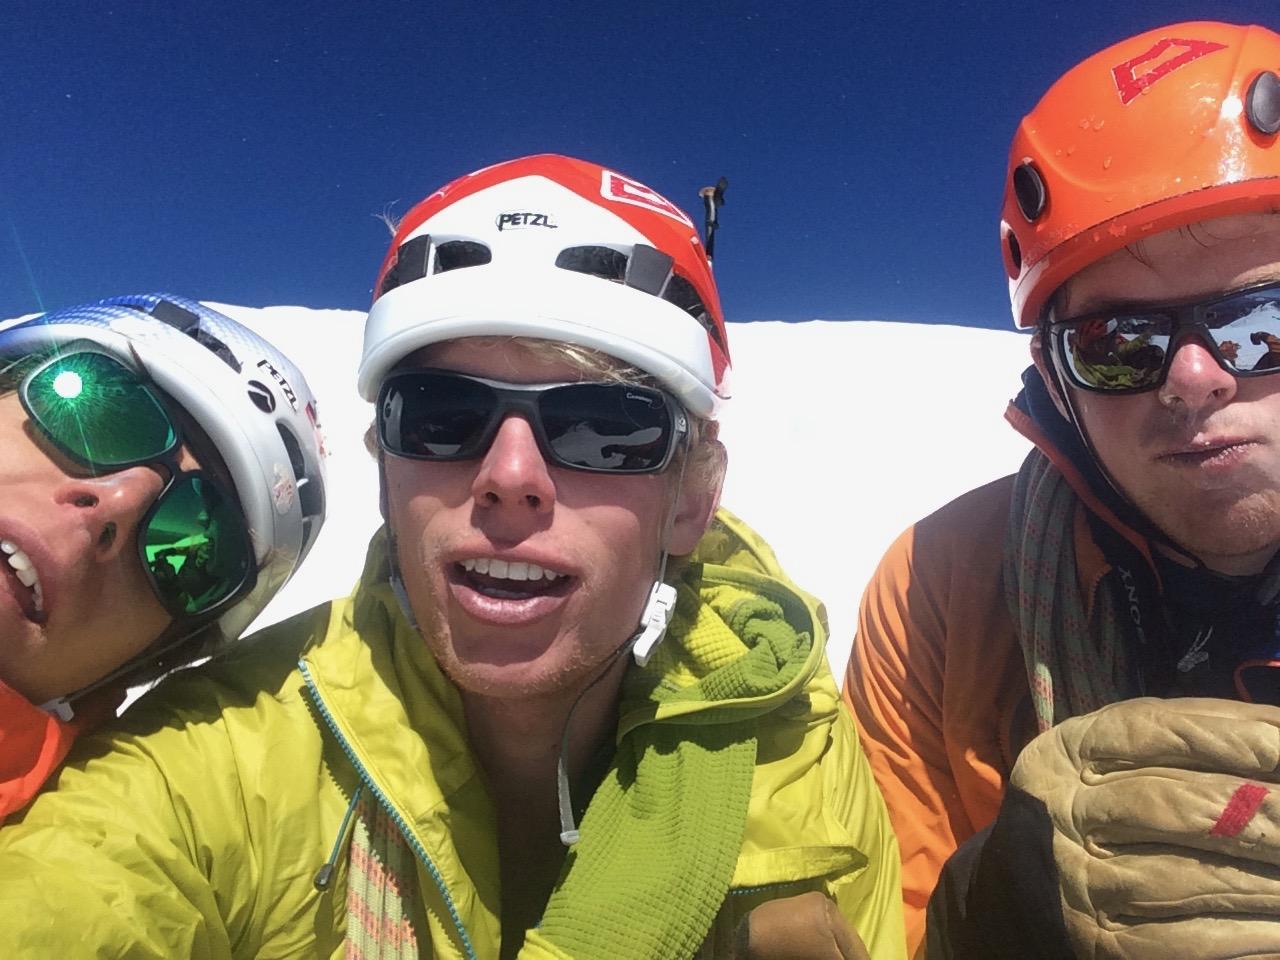 summit of mont blanc after divine providence. chamonix